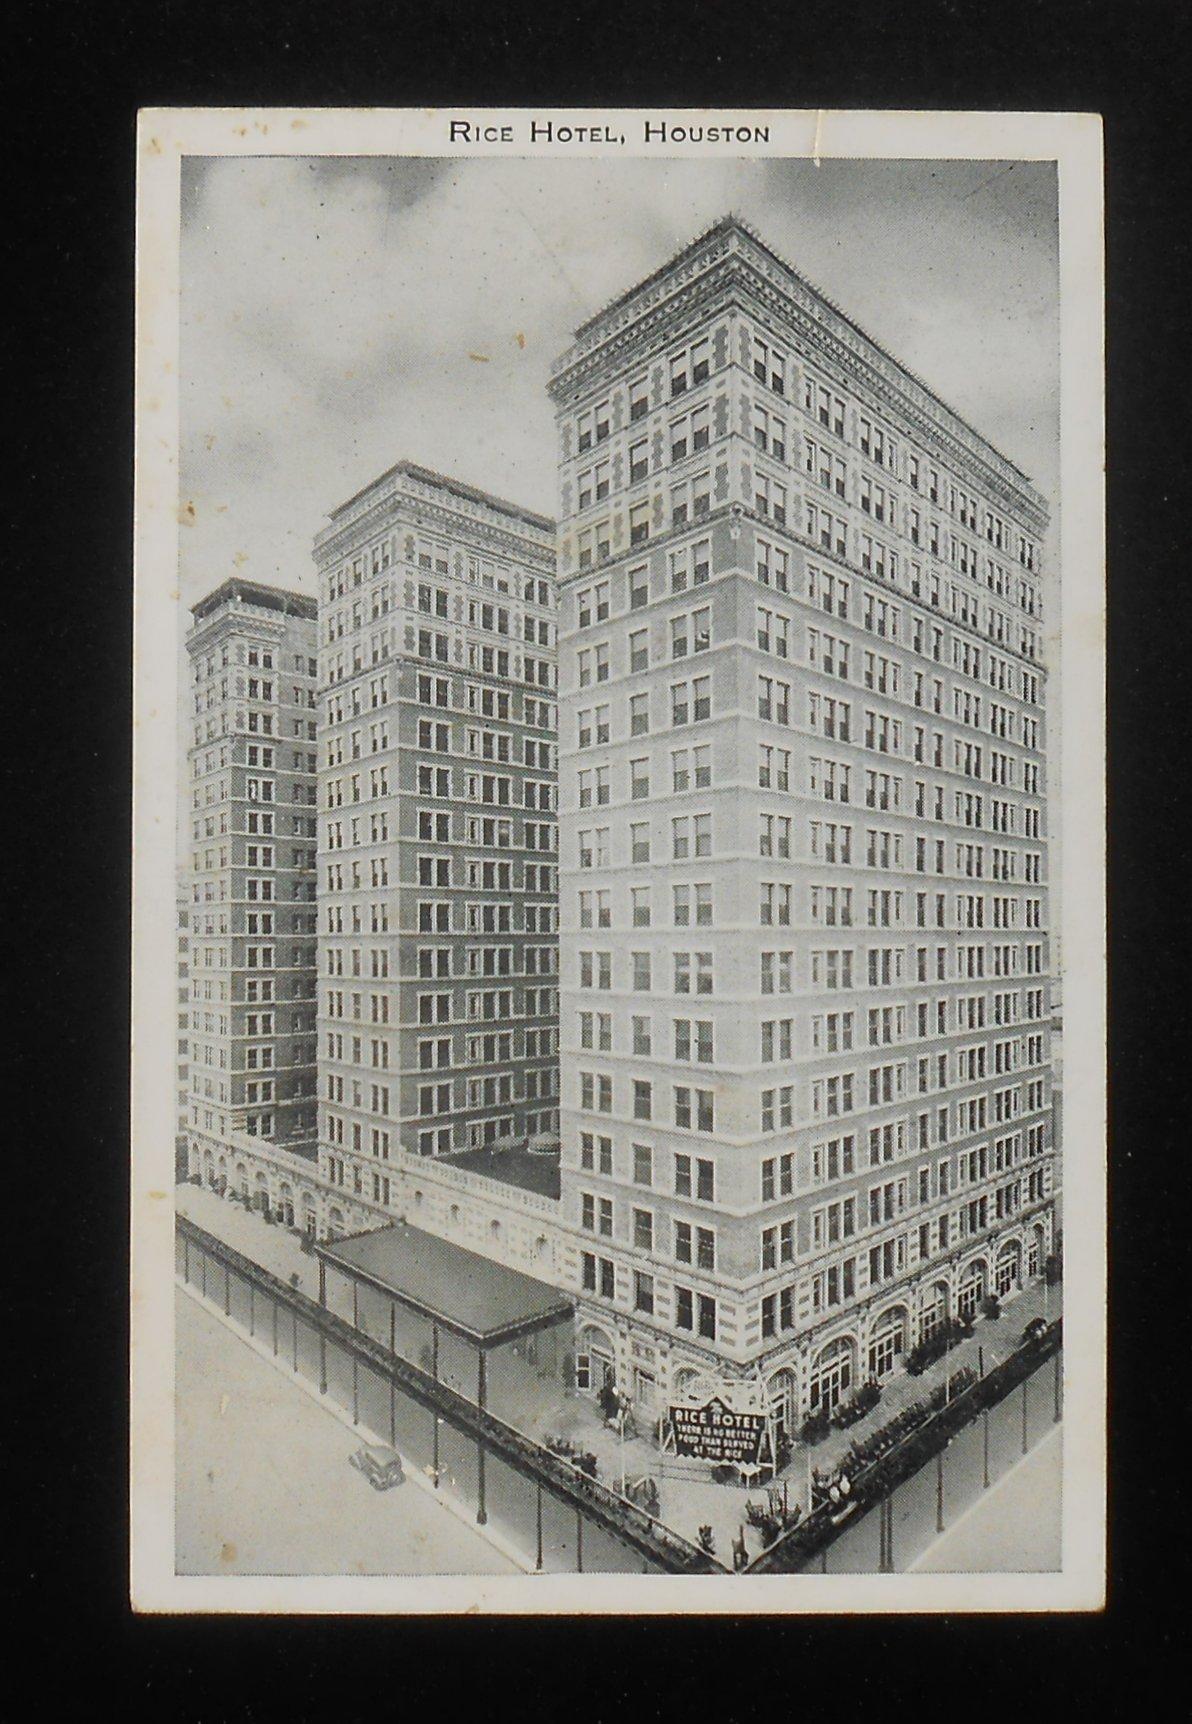 1930s Rice Hotel 1000 Rooms Houston Tx Harris Co Postcard Texas Ebay